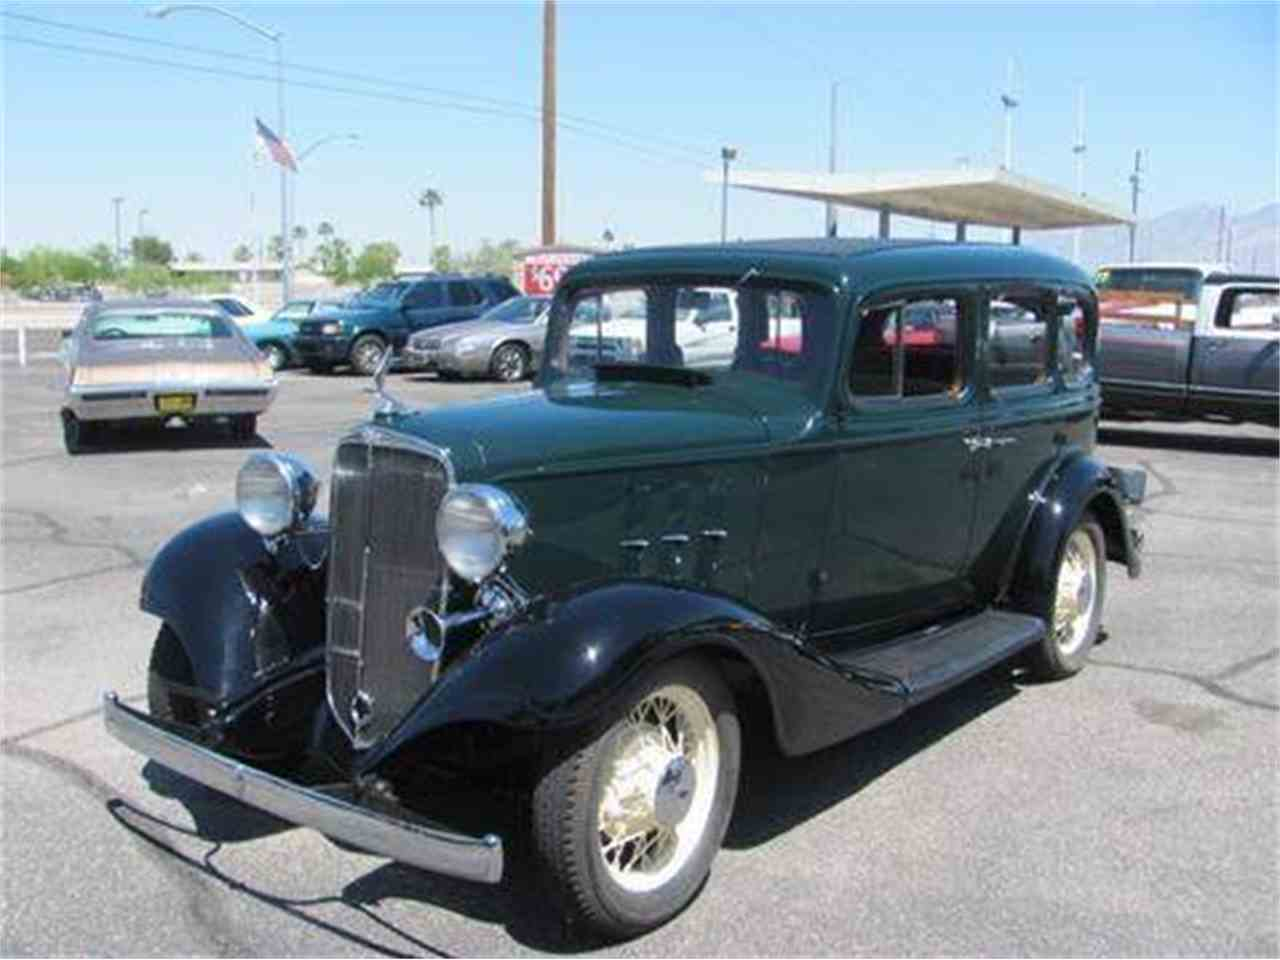 Car classic arizona insurance antique Foto